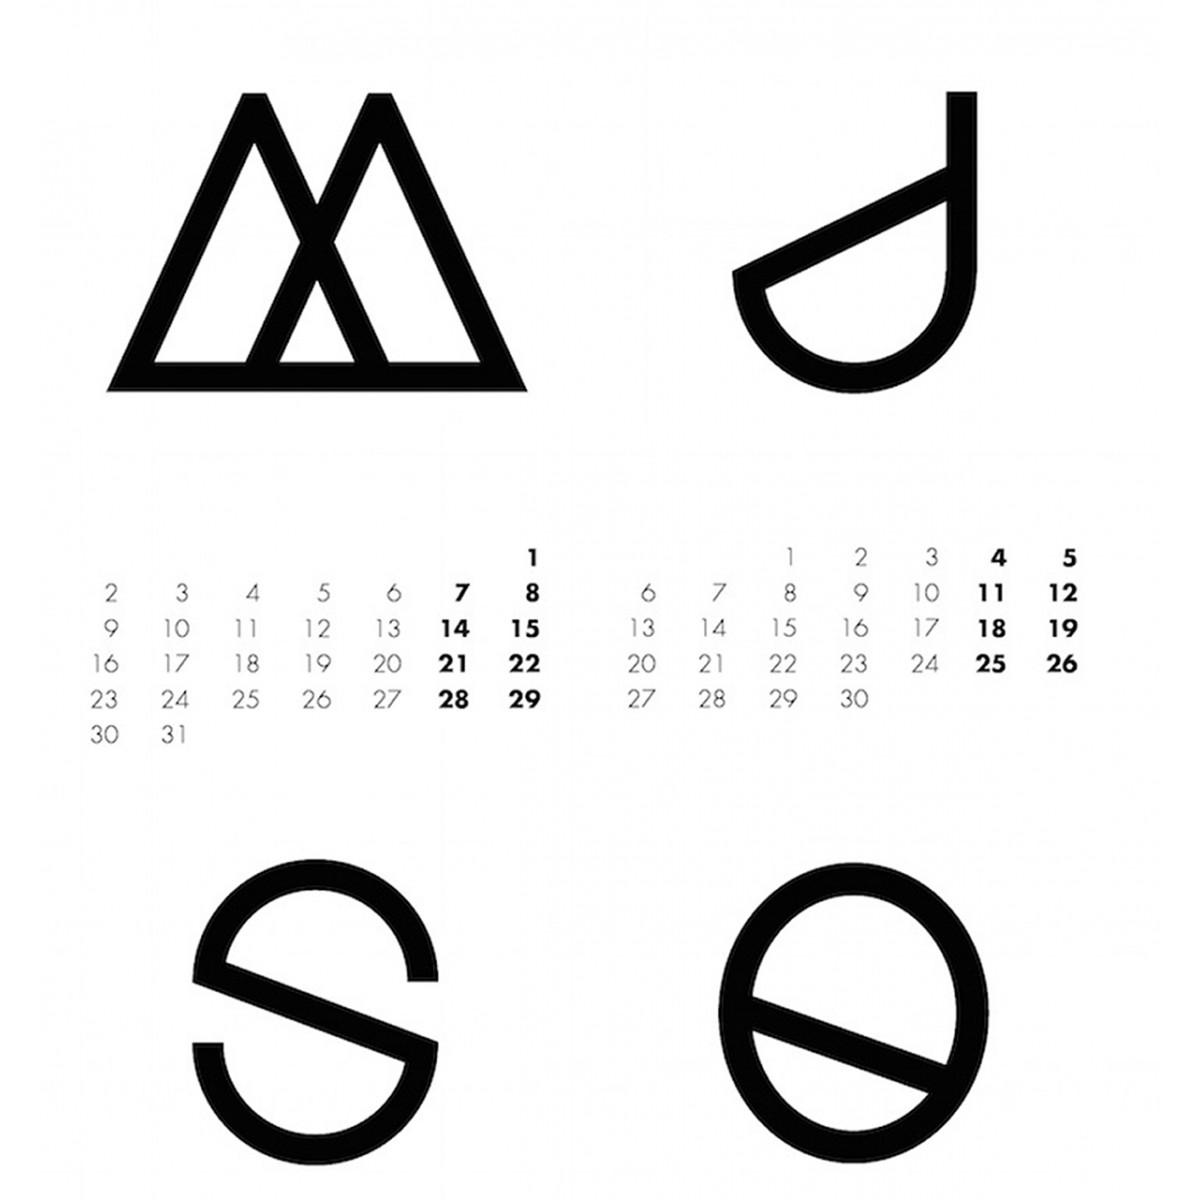 na.hili 2017 KALENDER Geometrical ABC - 50x70 schwarz / weiß - Poster